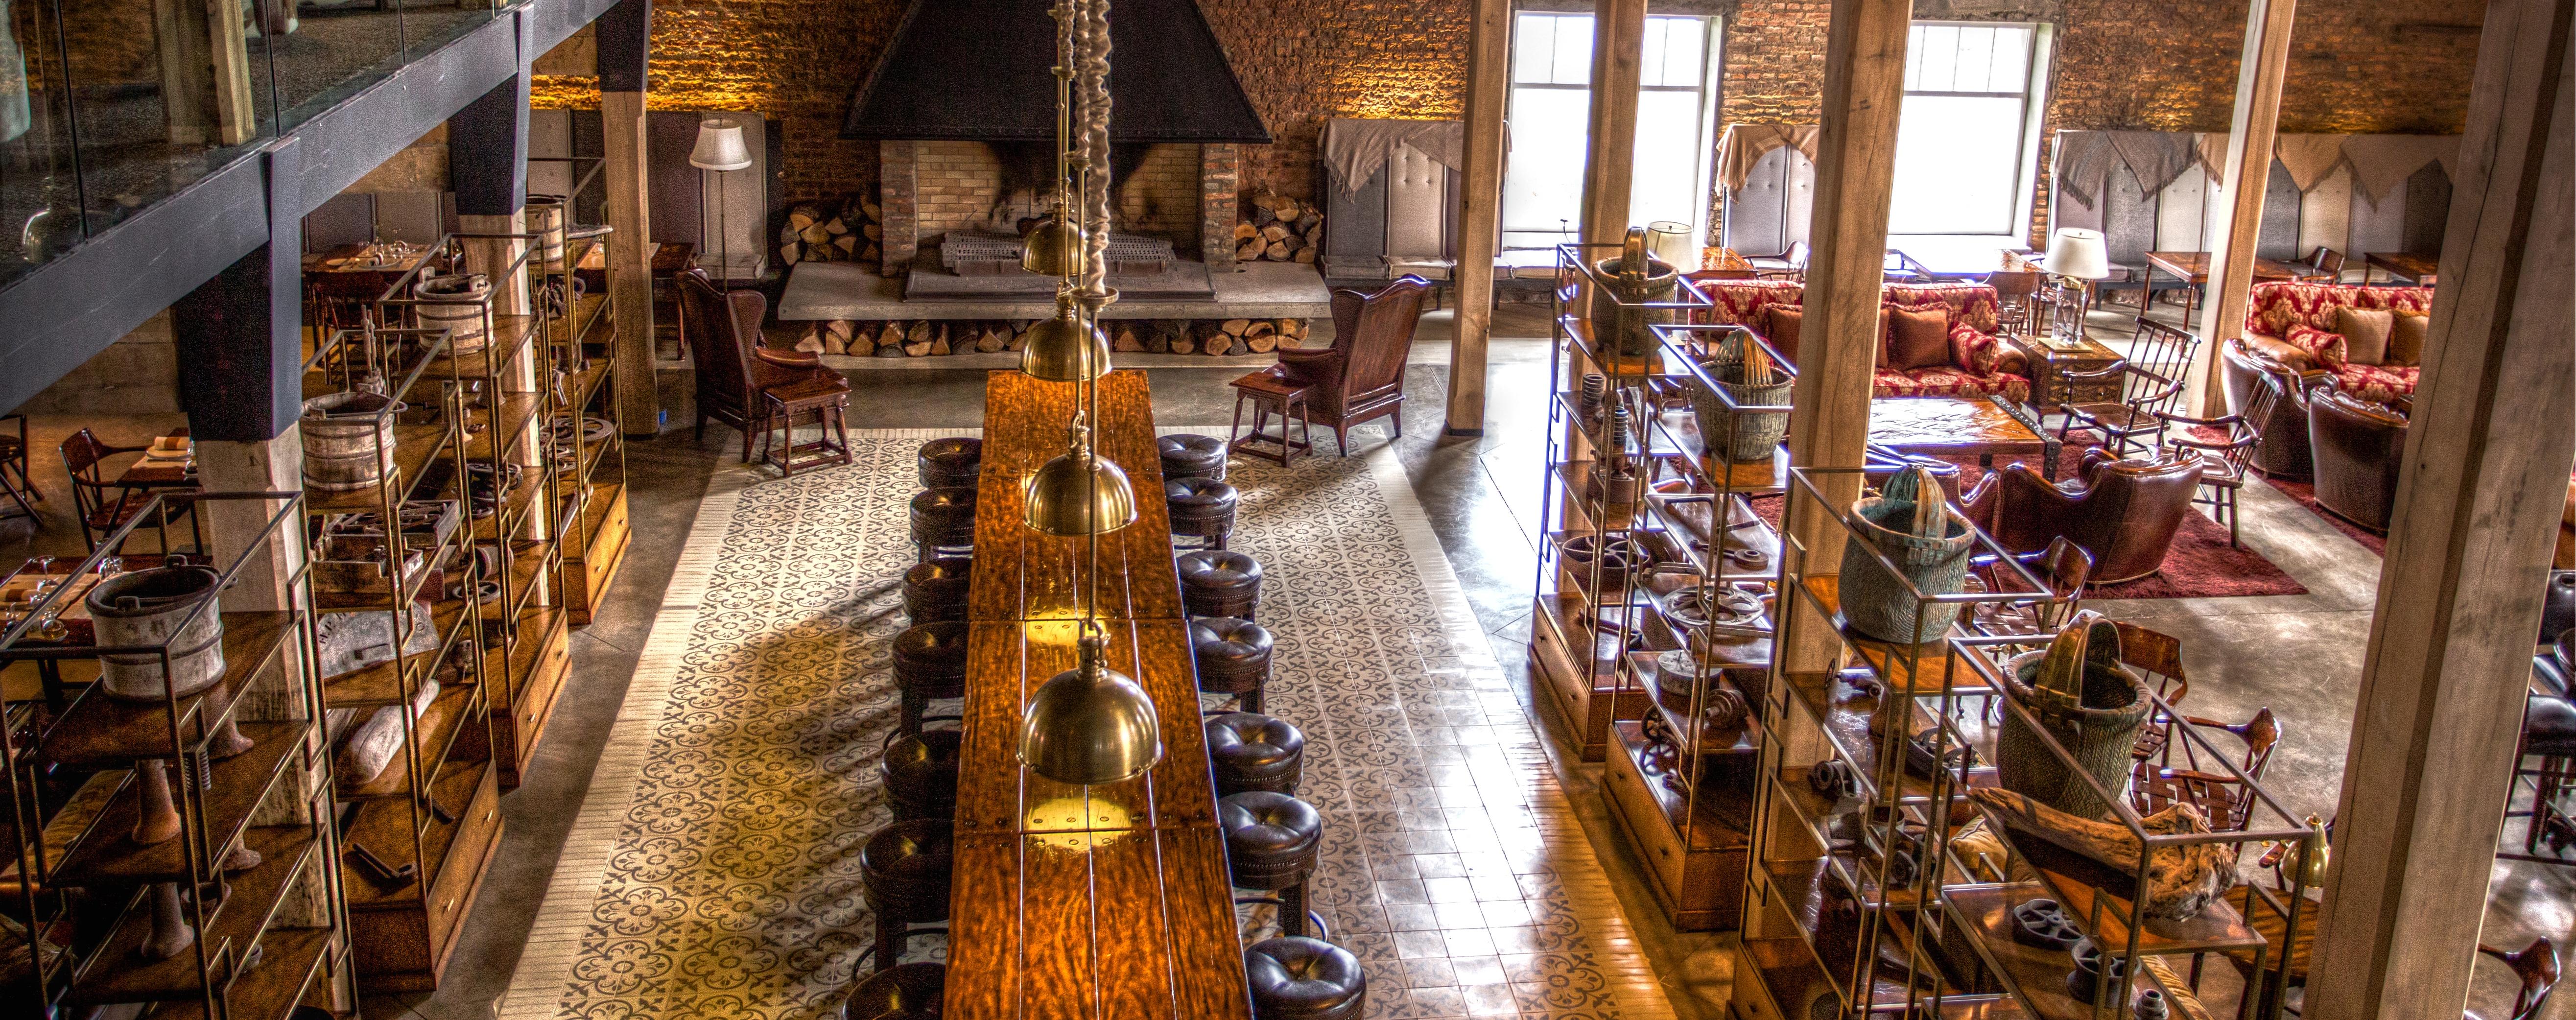 singular-patagonia-hotel-restaurant